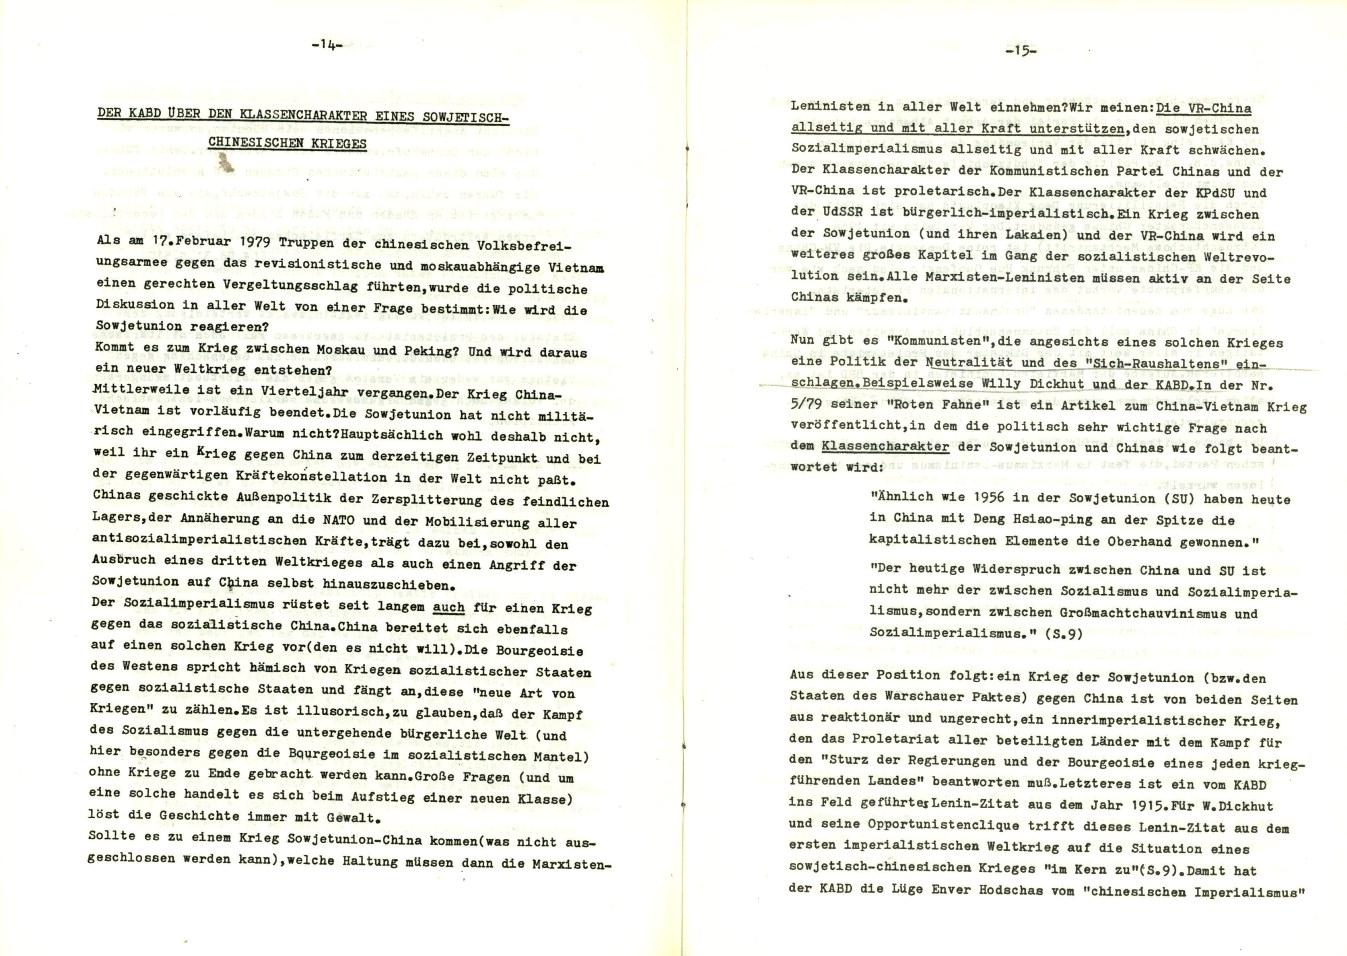 Muenchen_Kampf_dem_Revisionismus_1979_10_08